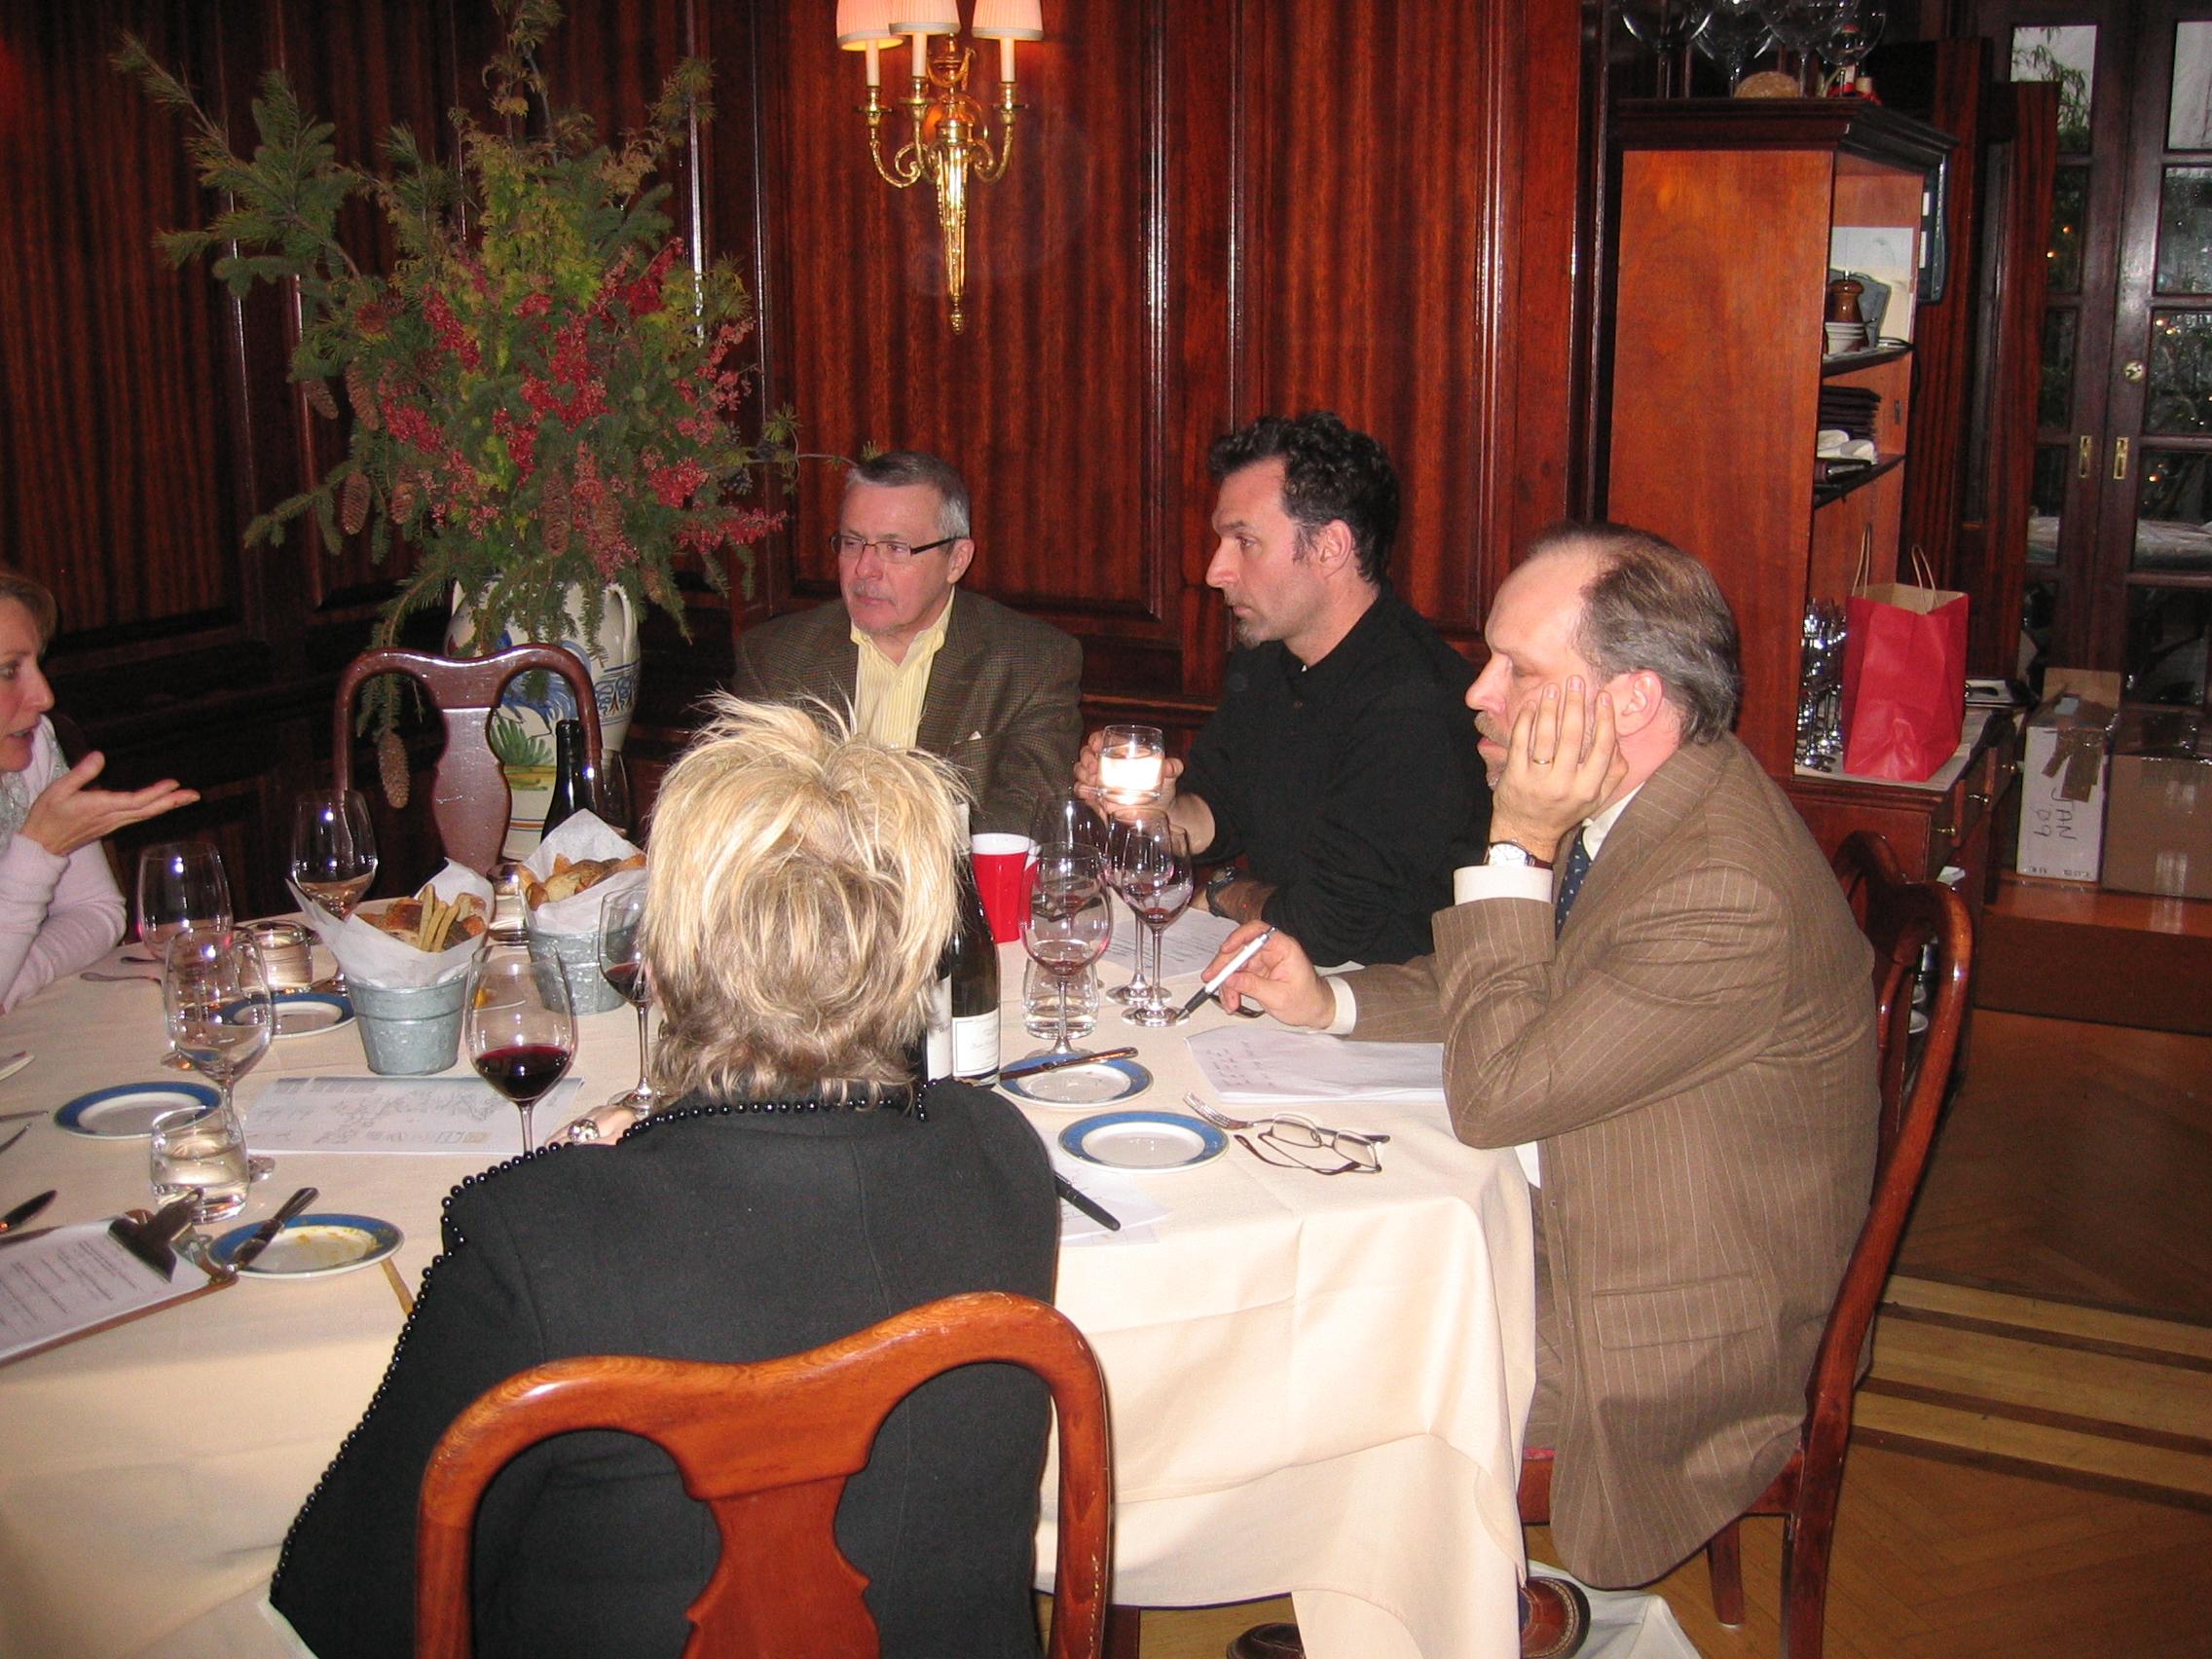 Francais Monologue C F H G D M France Creamer And Plate